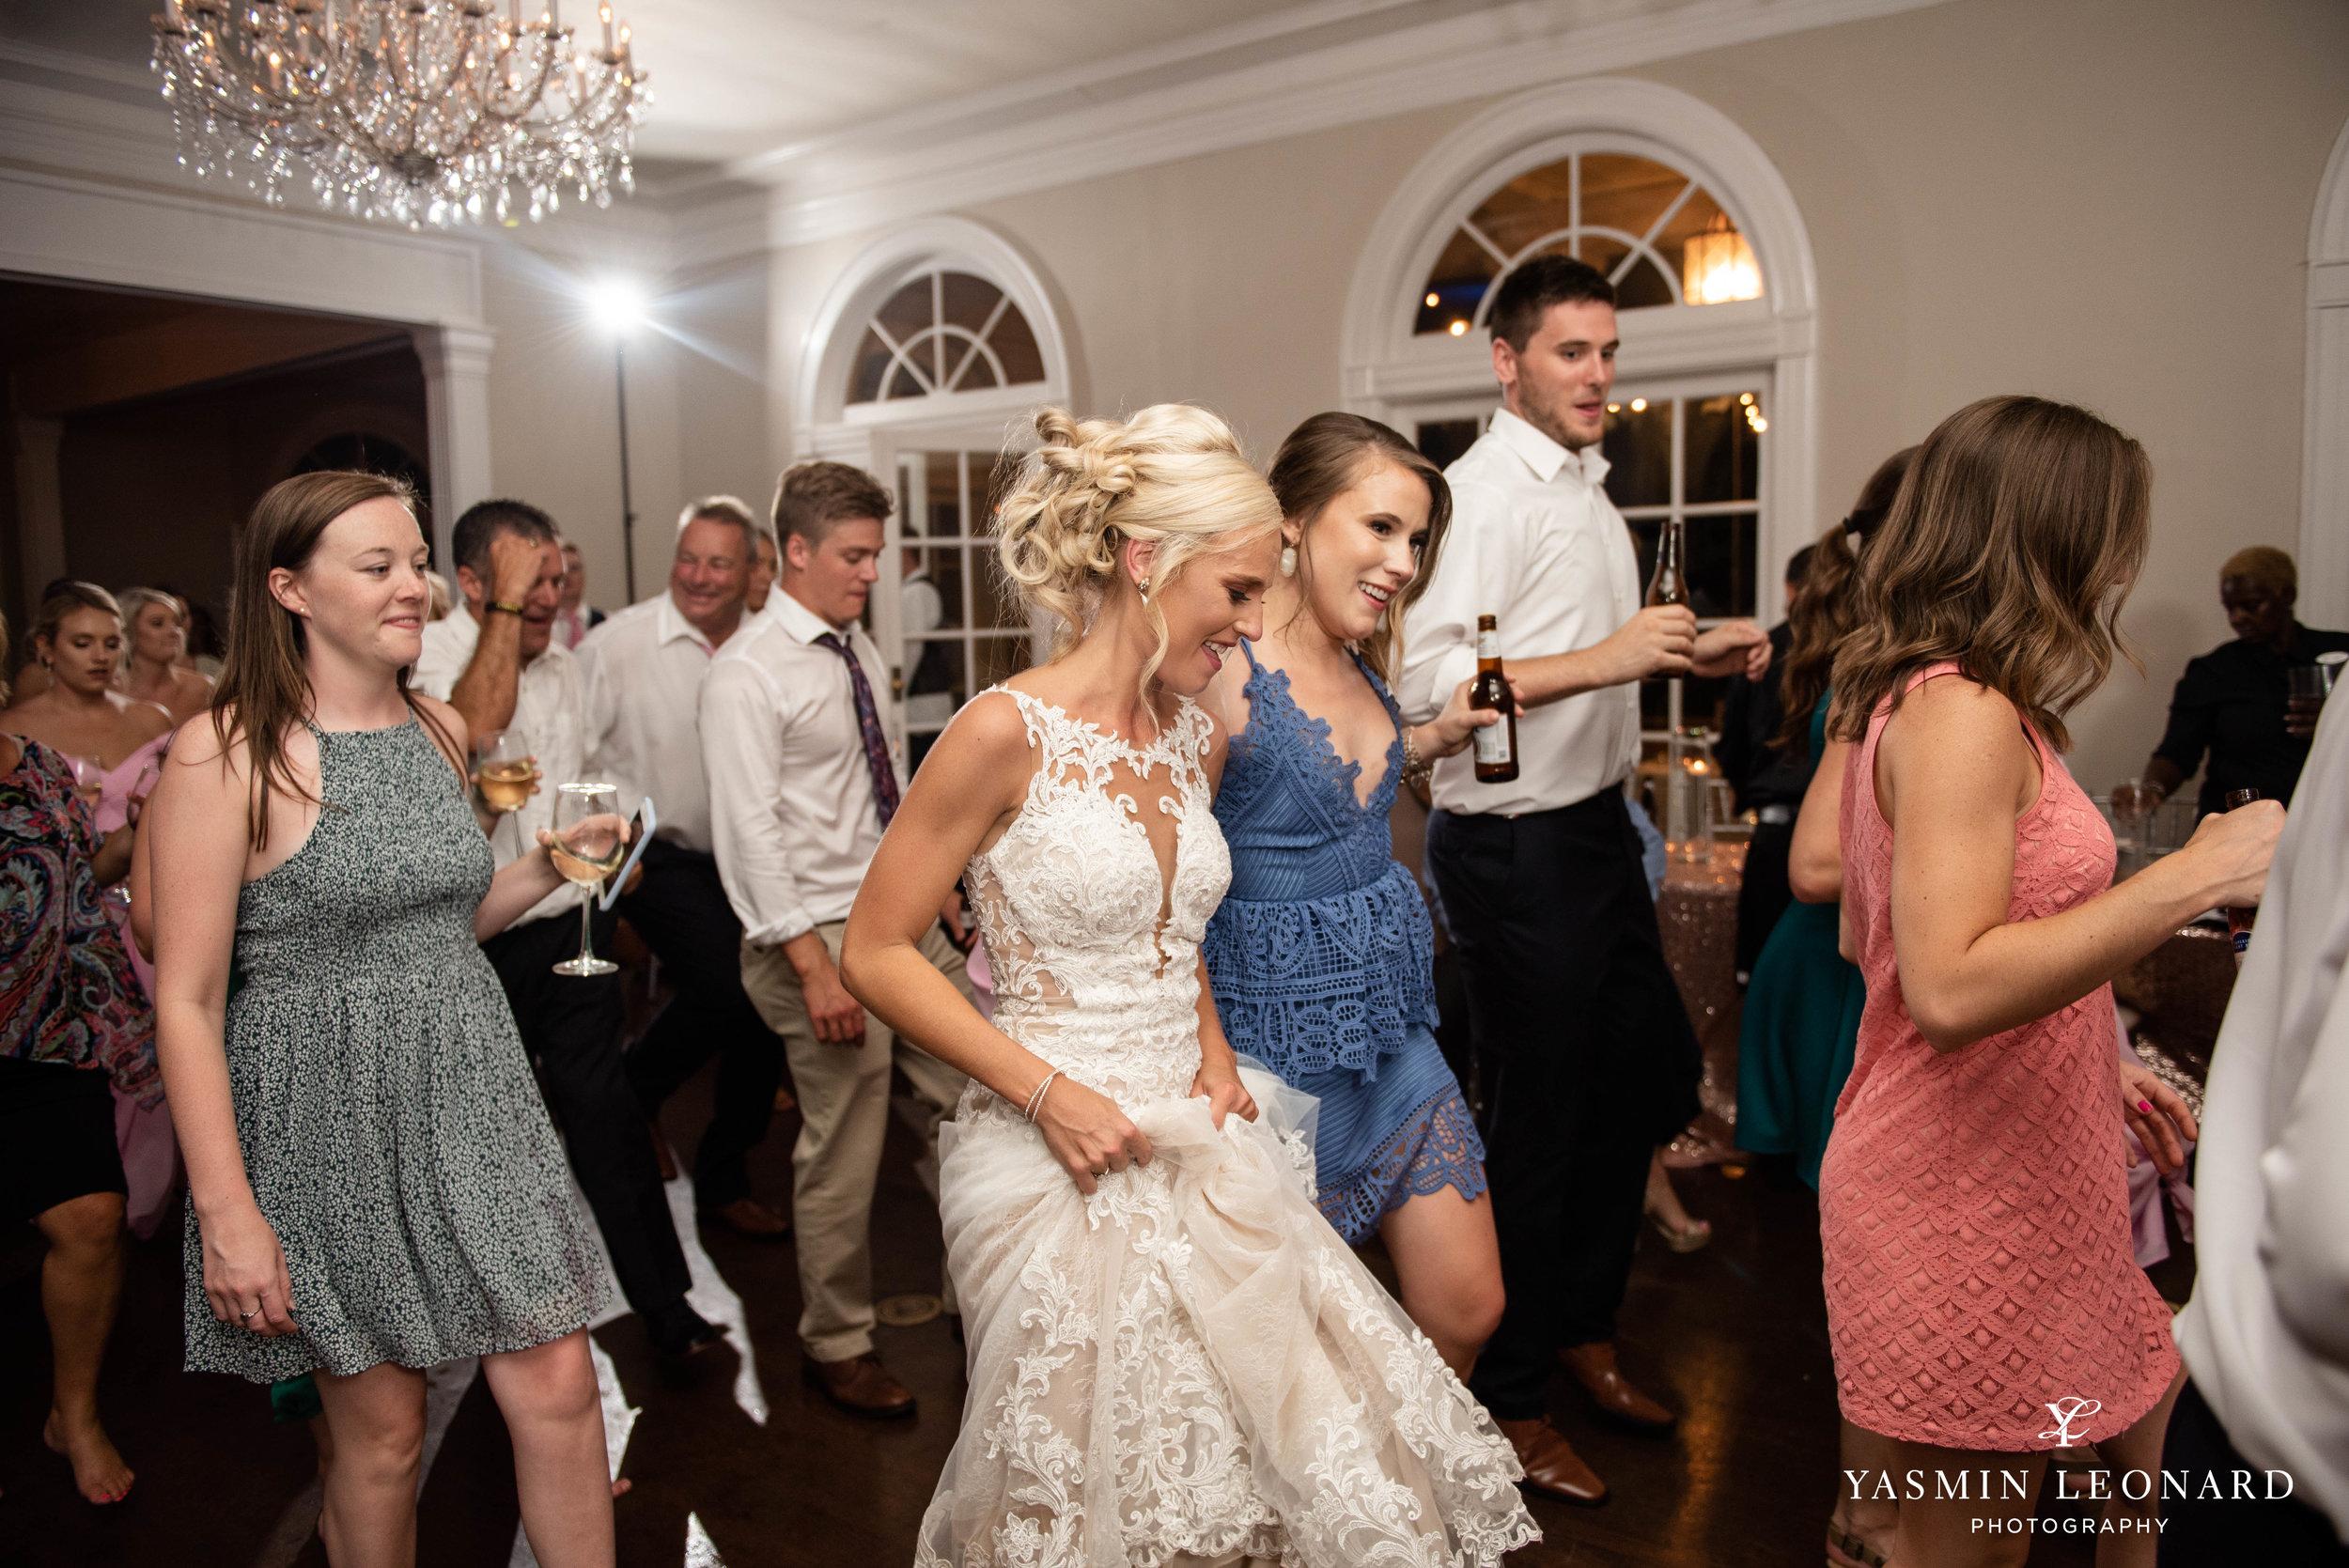 Separk Mansion - NC Weddings - Gastonia Wedding - NC Wedding Venues - Pink and Blue Wedding Ideas - Pink Bridesmaid Dresses - Yasmin Leonard Photography-68.jpg